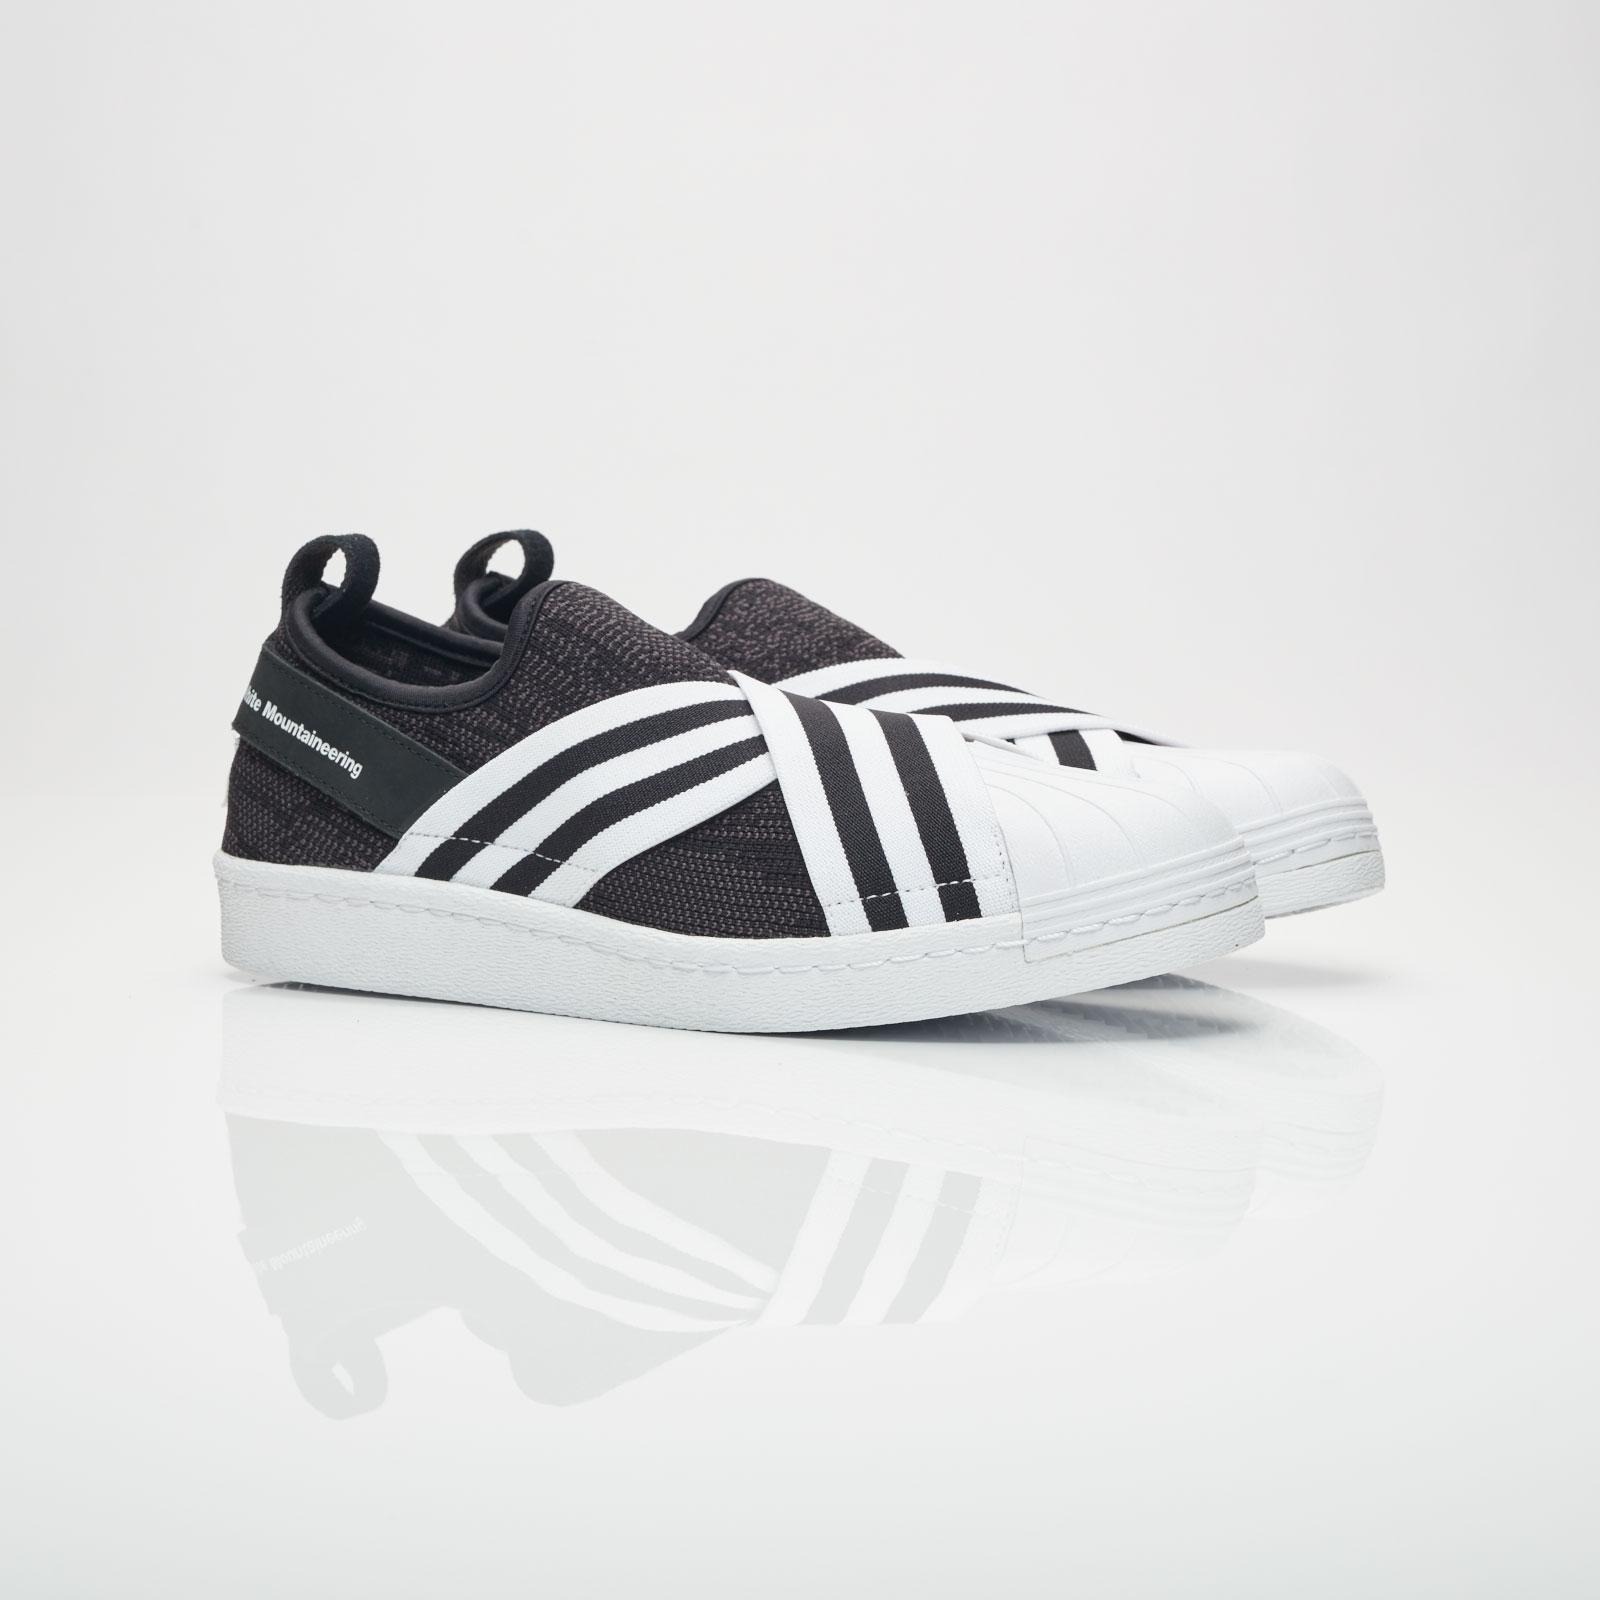 adidas Wm Superstar Slip On Pk By2880 Sneakersnstuff I